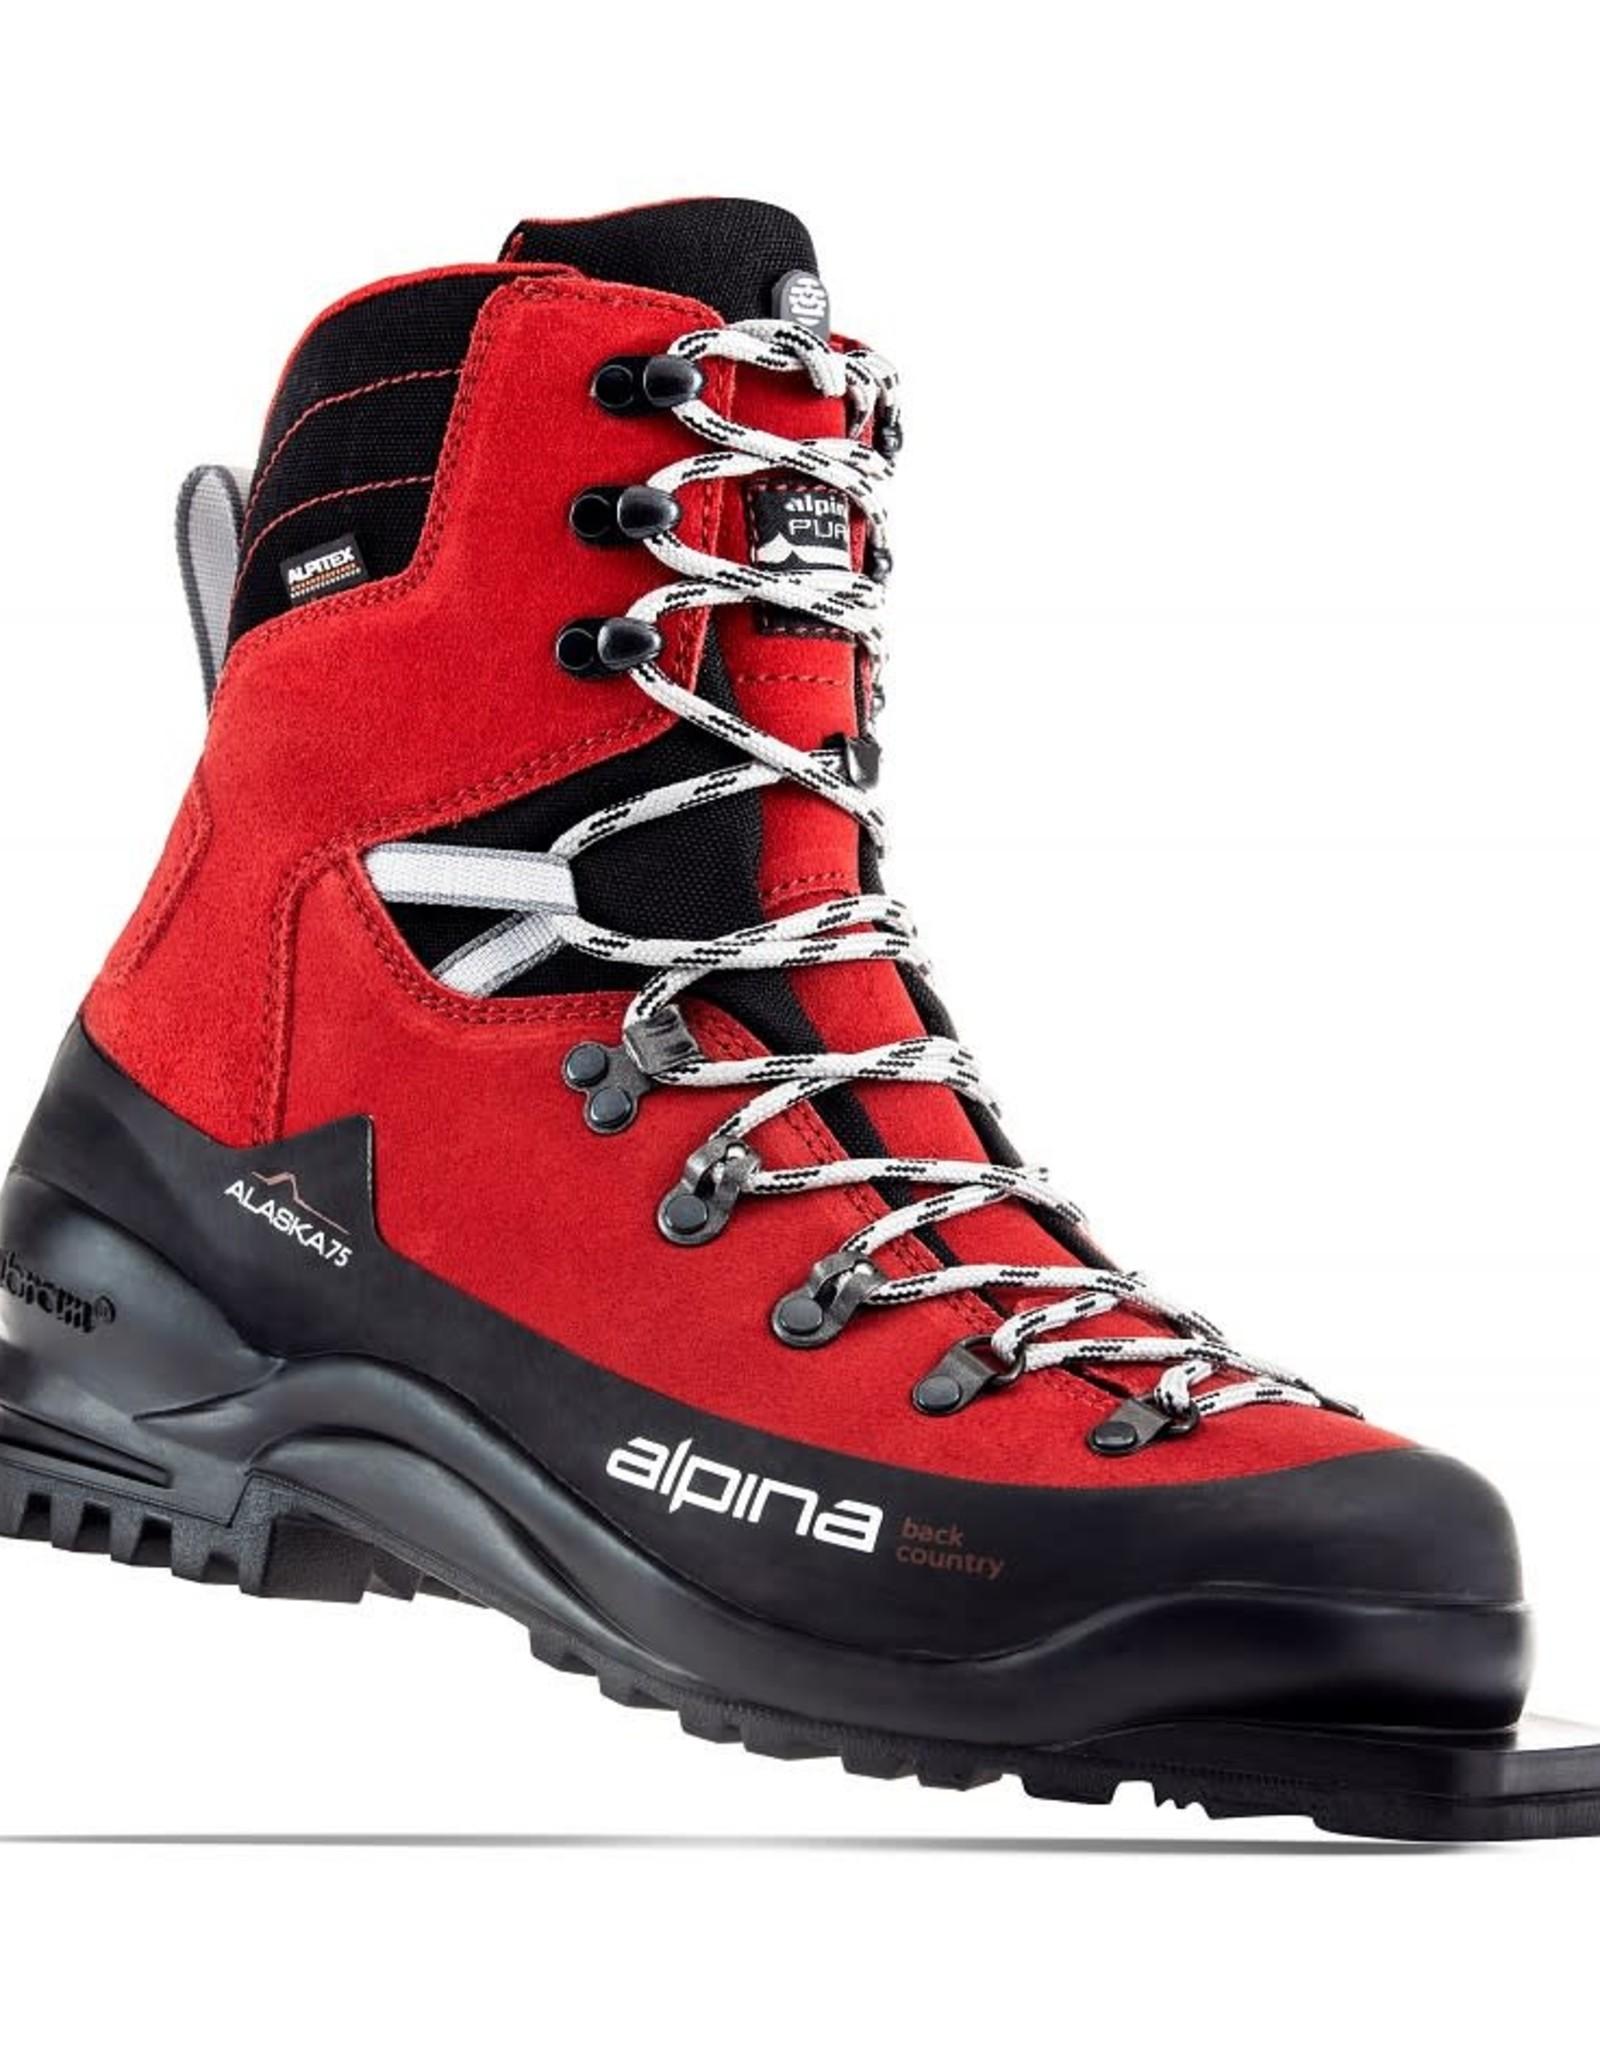 Alpina Alpina 2022 Alaska 75mm Backcountry Ski Boots